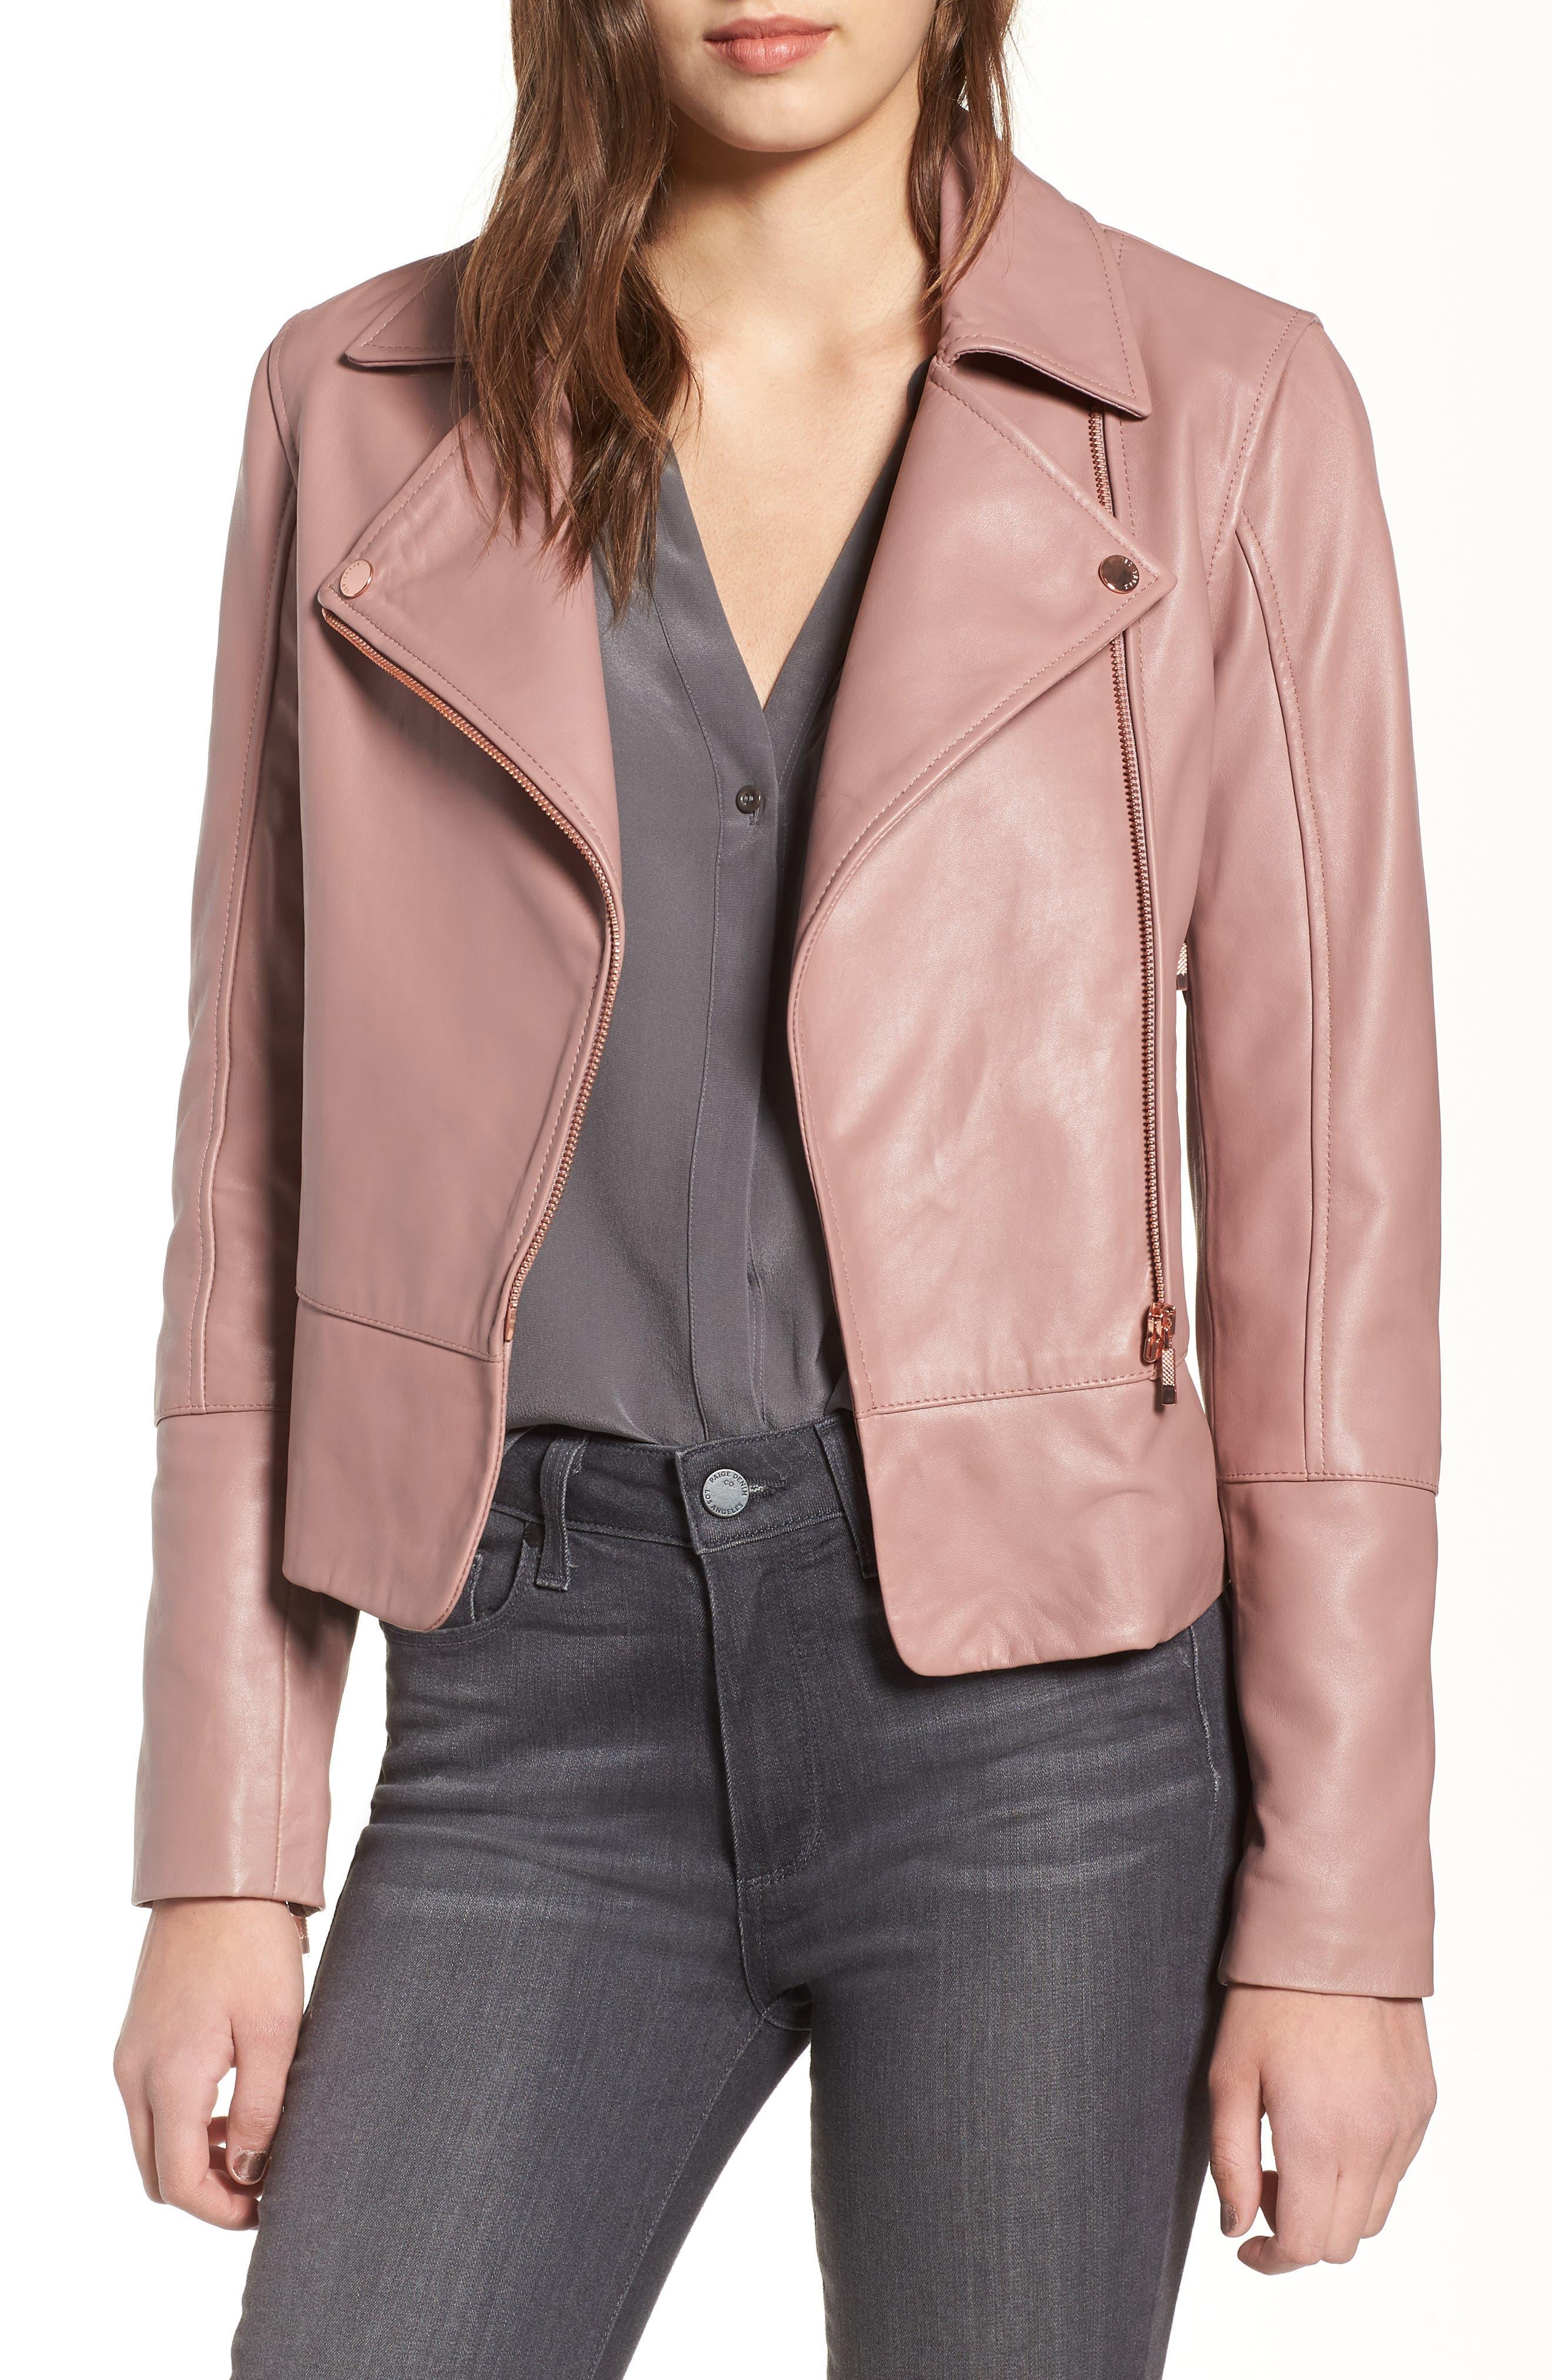 Lizia Leather Biker Jacket,                         Main,                         color, Dusky Pink